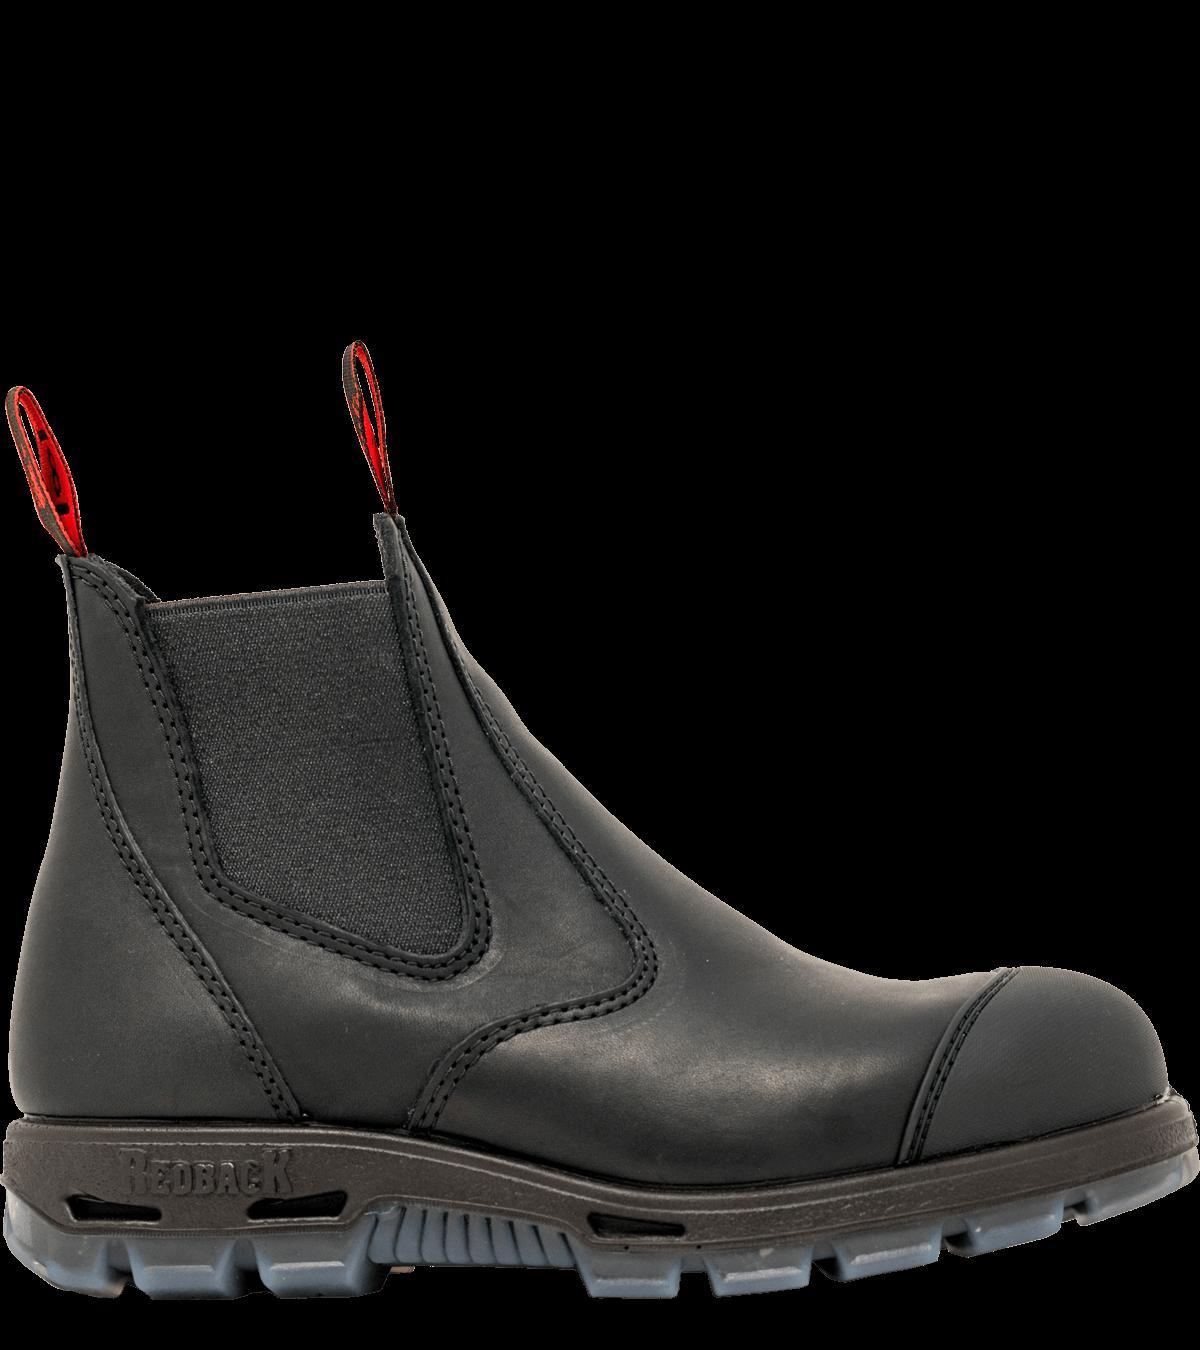 4a7f1232a71 Easy Escape HD (Steel Toe) | Redback Boots®